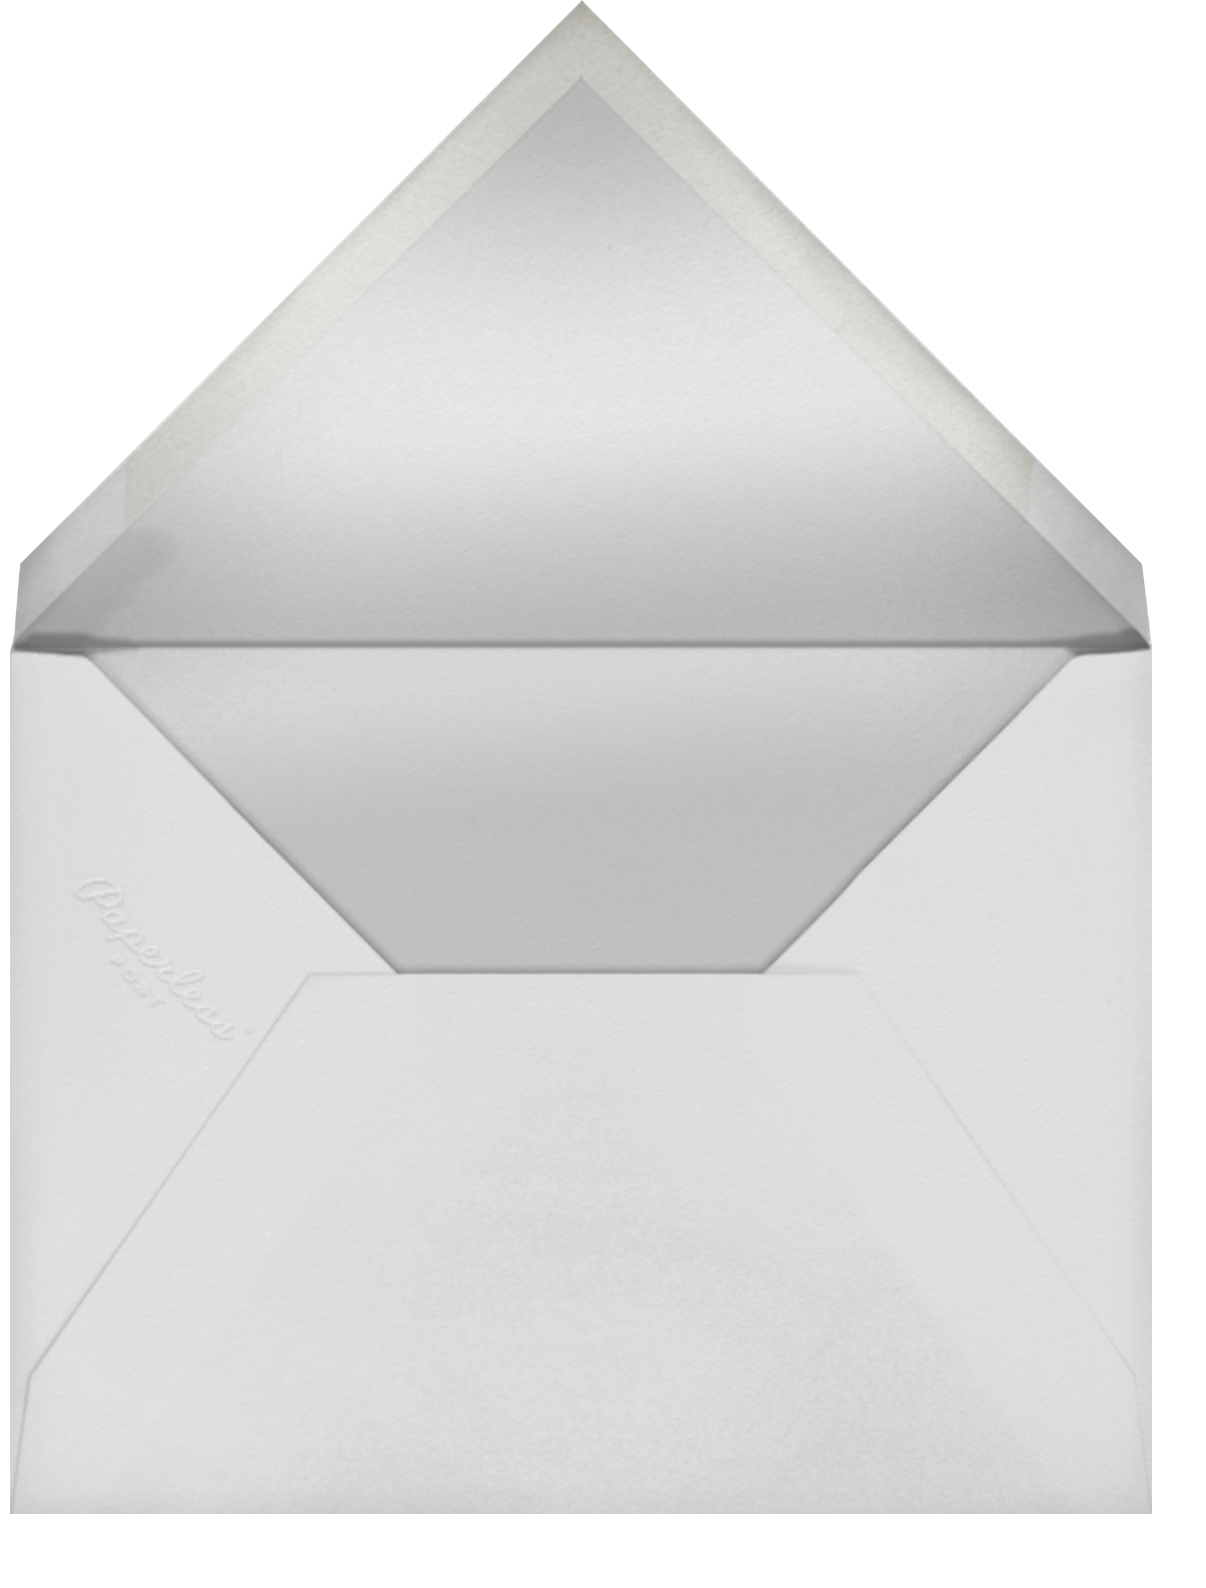 Split Screen - Ivory - Paperless Post - Envelope